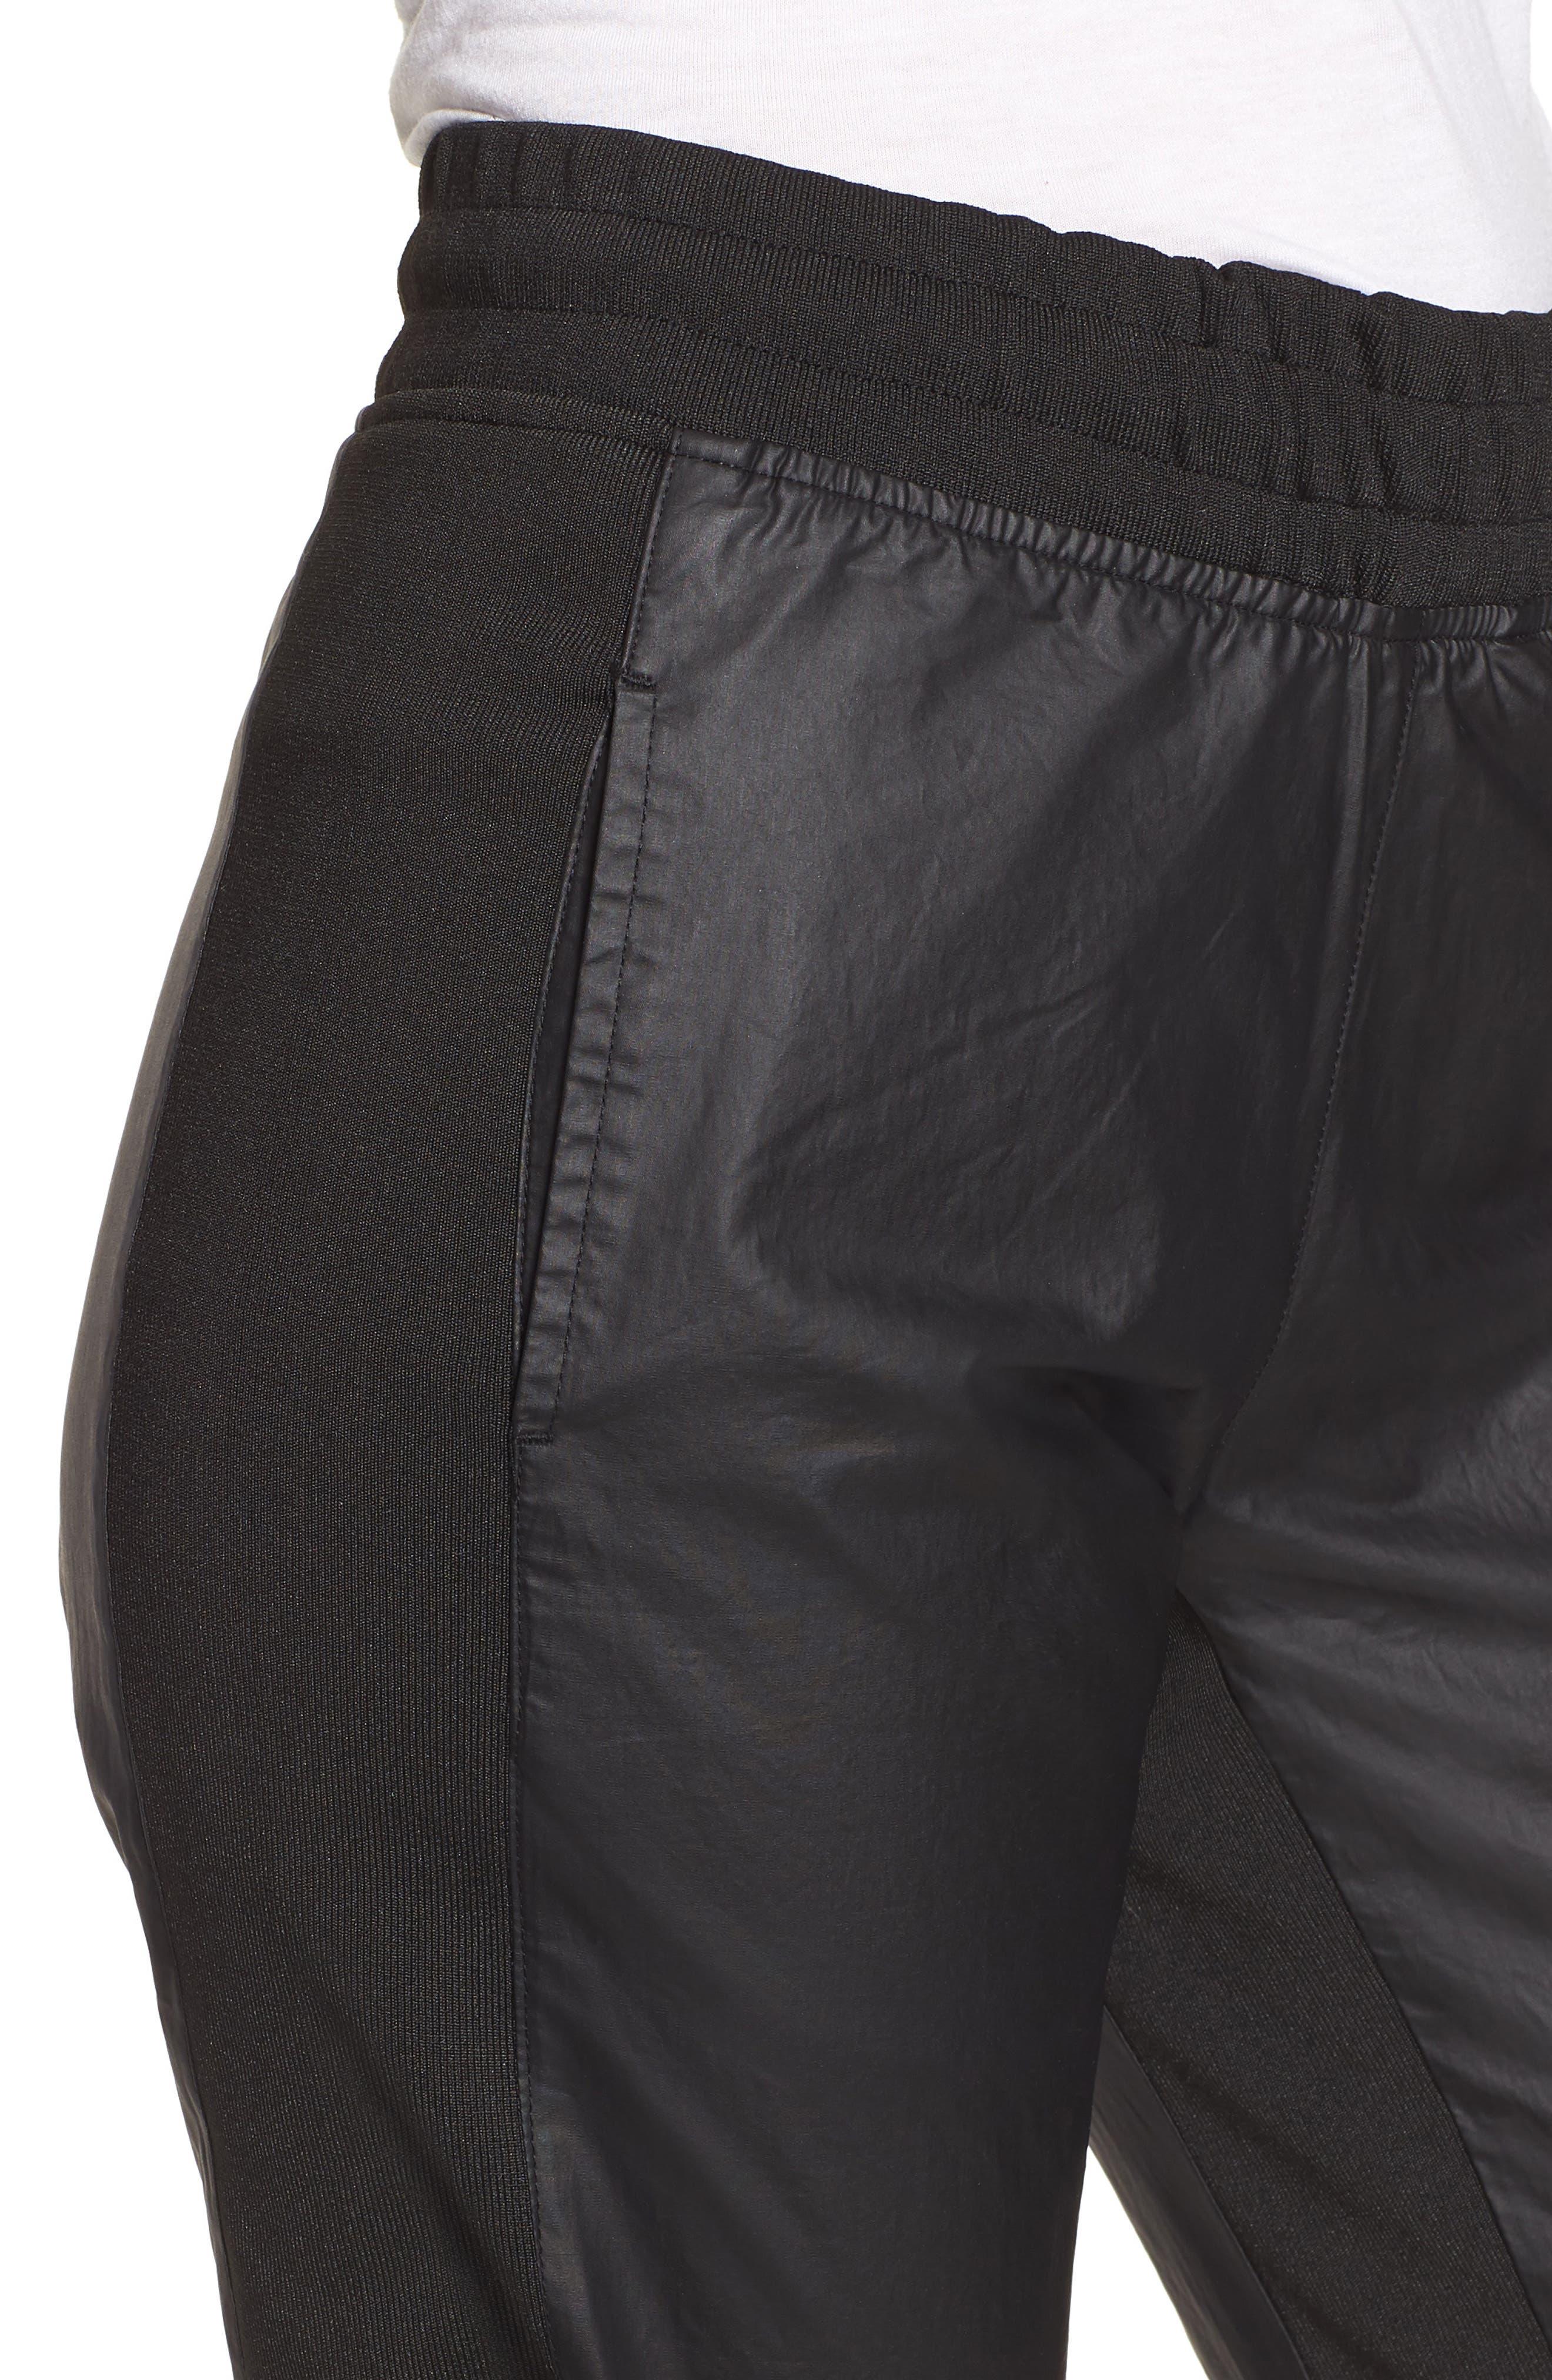 Paneled Jogger Pants,                             Alternate thumbnail 4, color,                             001